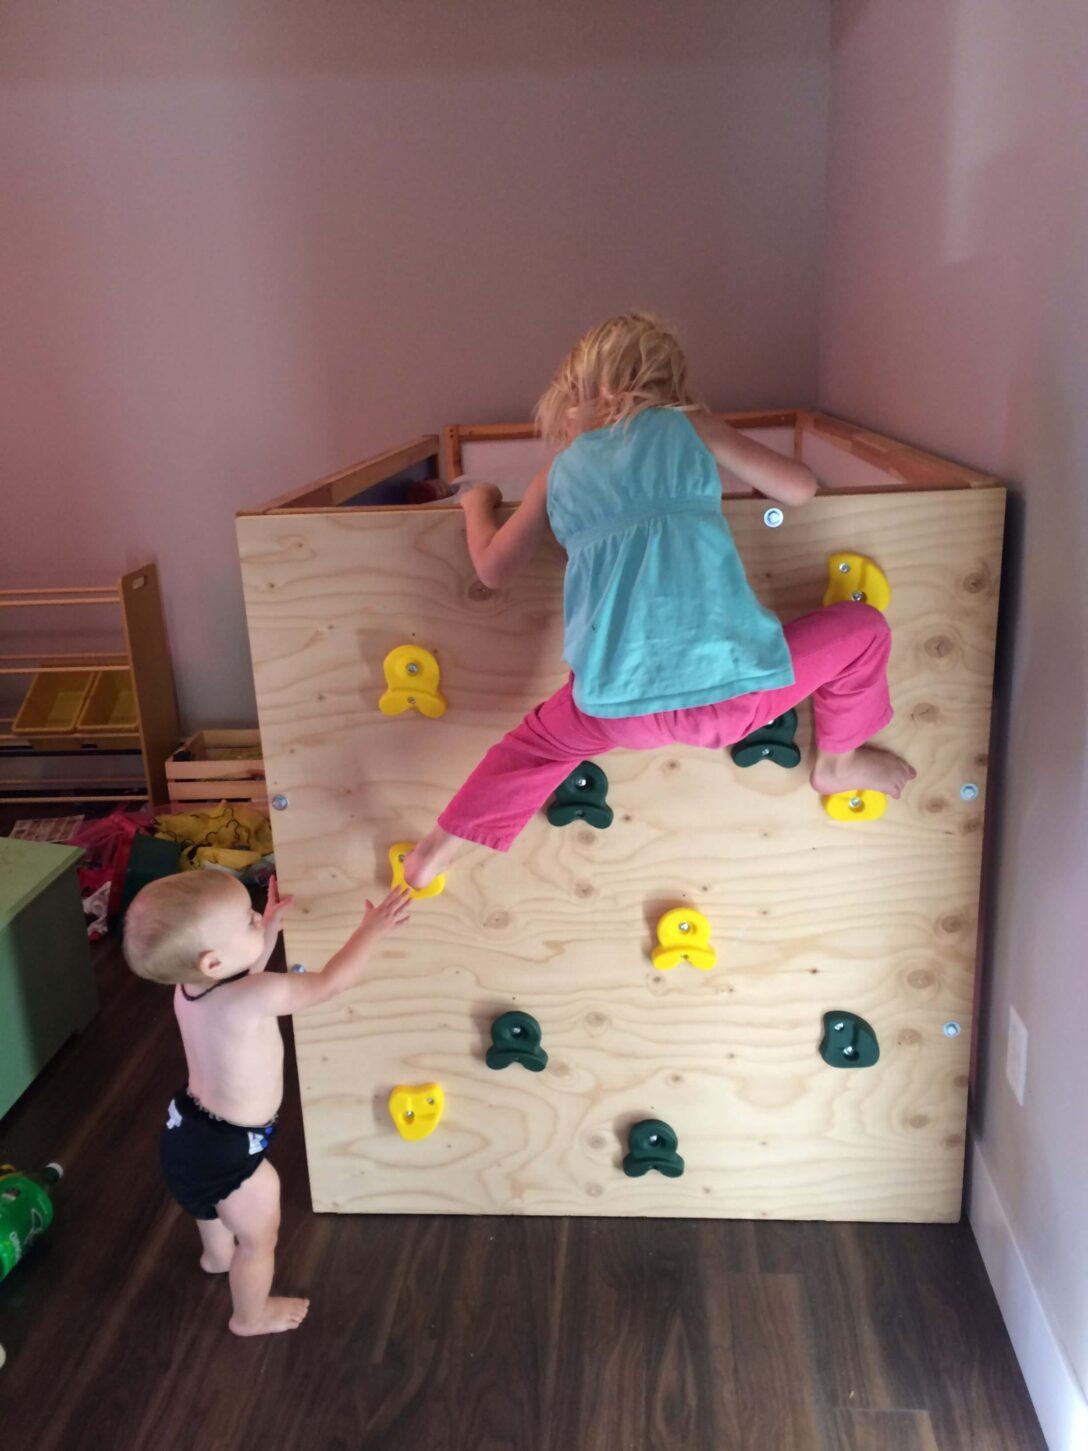 Large Size of Kura Hack Ikea Bed Climbing Wall As Time Flies Wohnzimmer Kura Hack